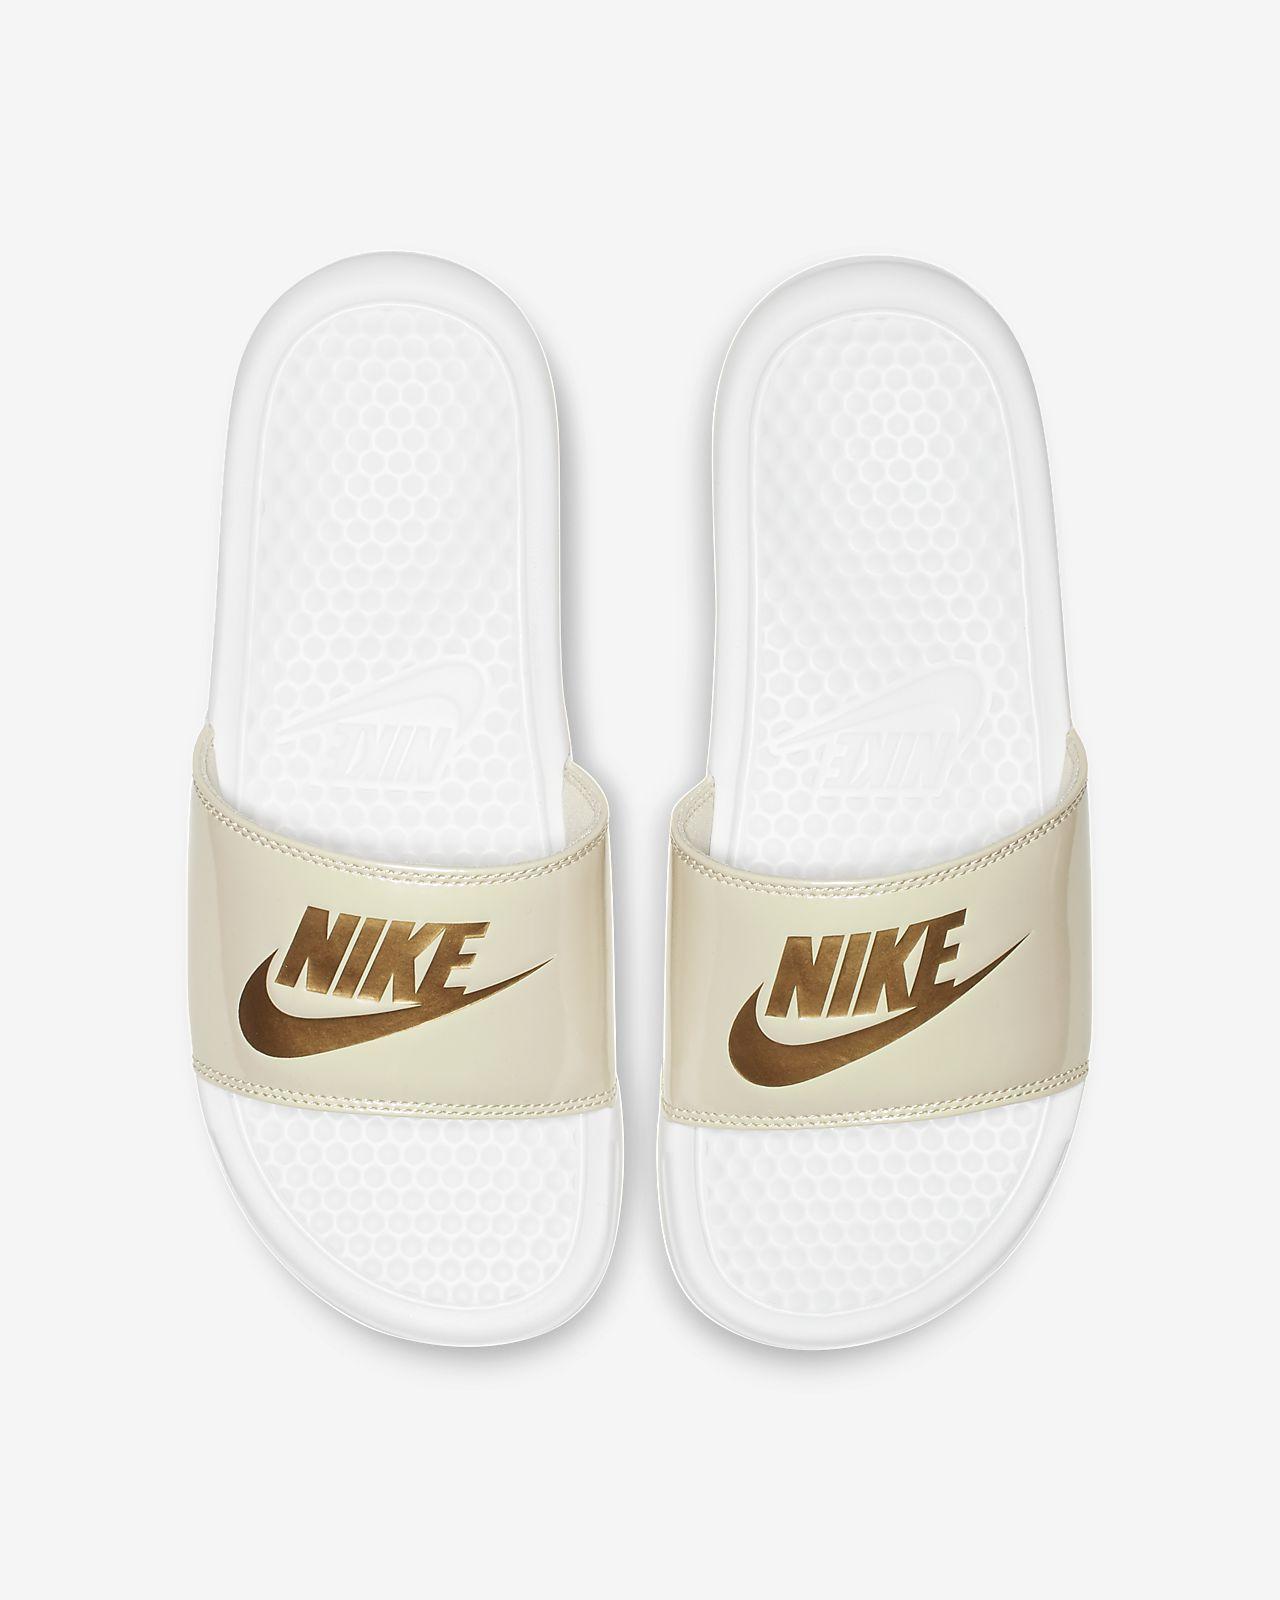 Pour Jdi Metallic Nike Ca Femme Wasxxaqf Benassi Claquette qOIxBqtwX